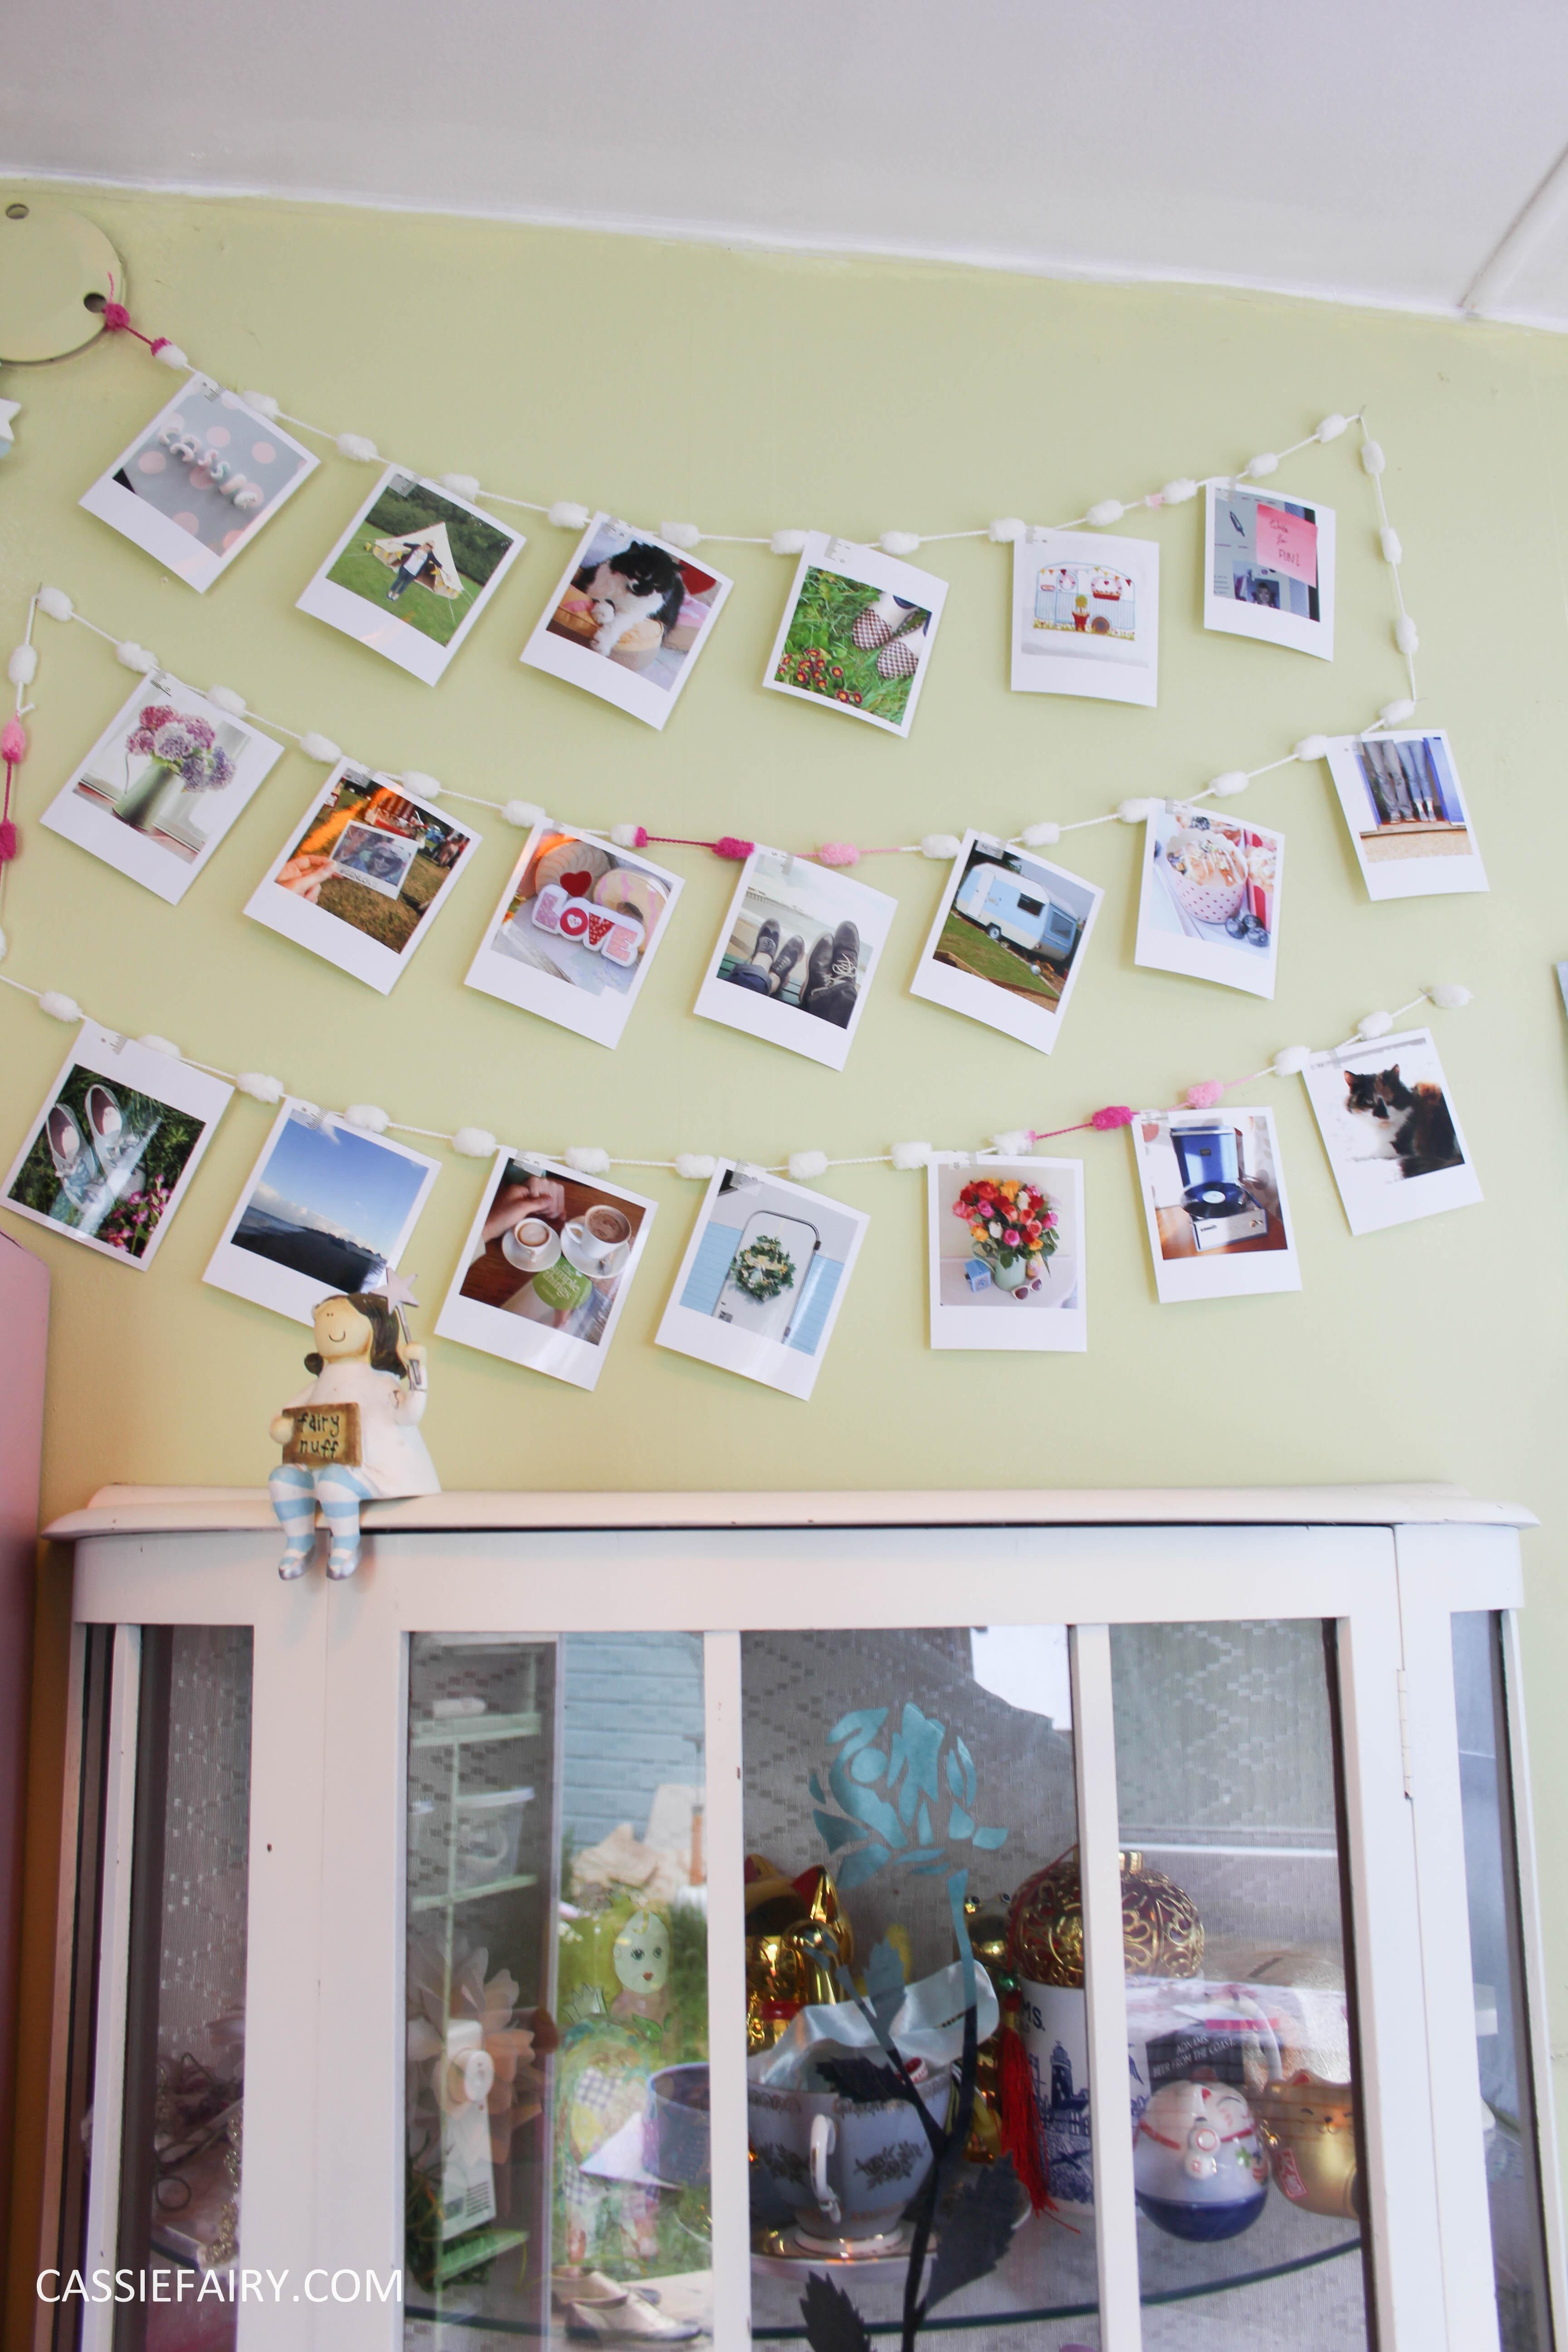 diy polariod photo wall display decoration using polabox-22